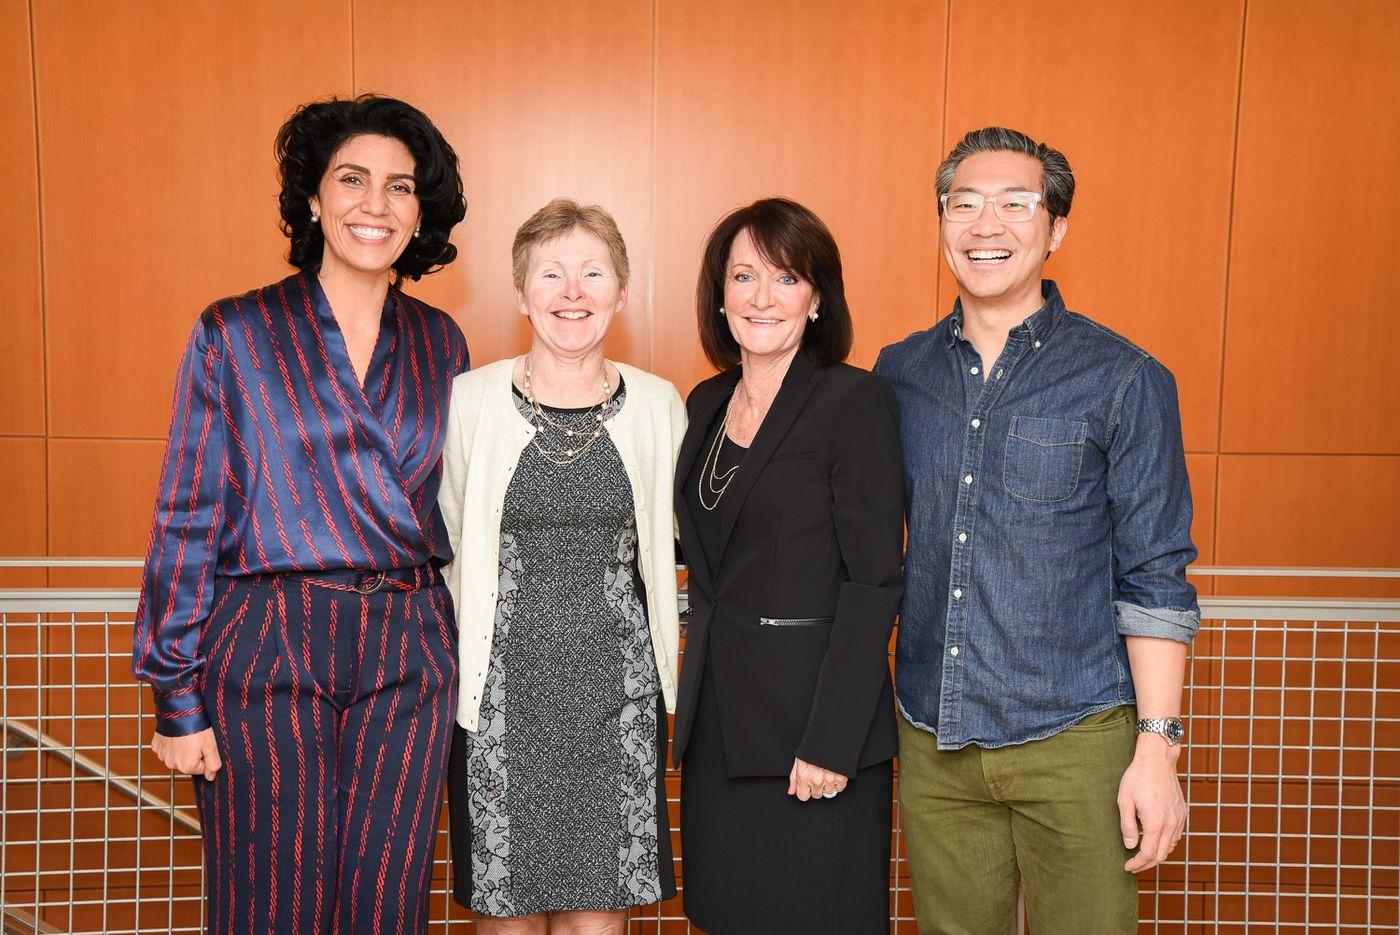 97e7c430d Grace Humanitarian Award recipient, Georgia Sarquella-Brugada, MD (left) is  pictured